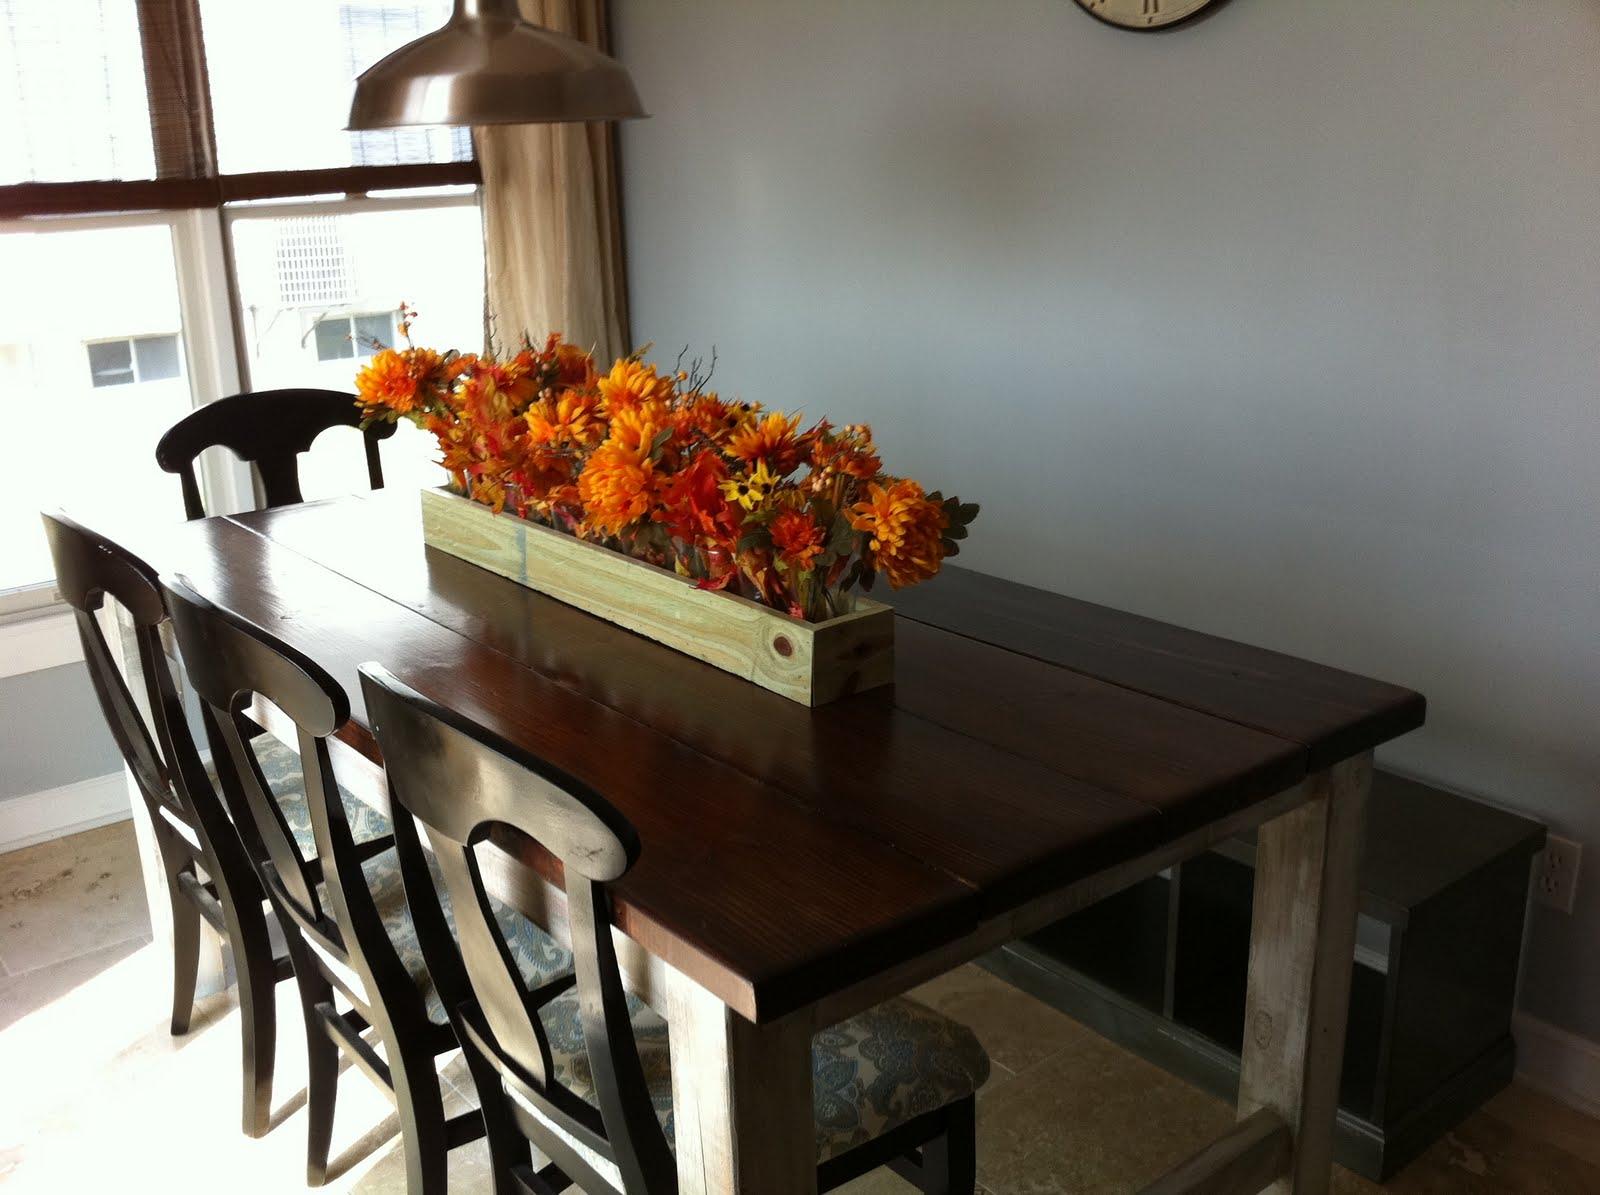 The Quaint Cottage: DIY Rustic Farmhouse Table (Finish